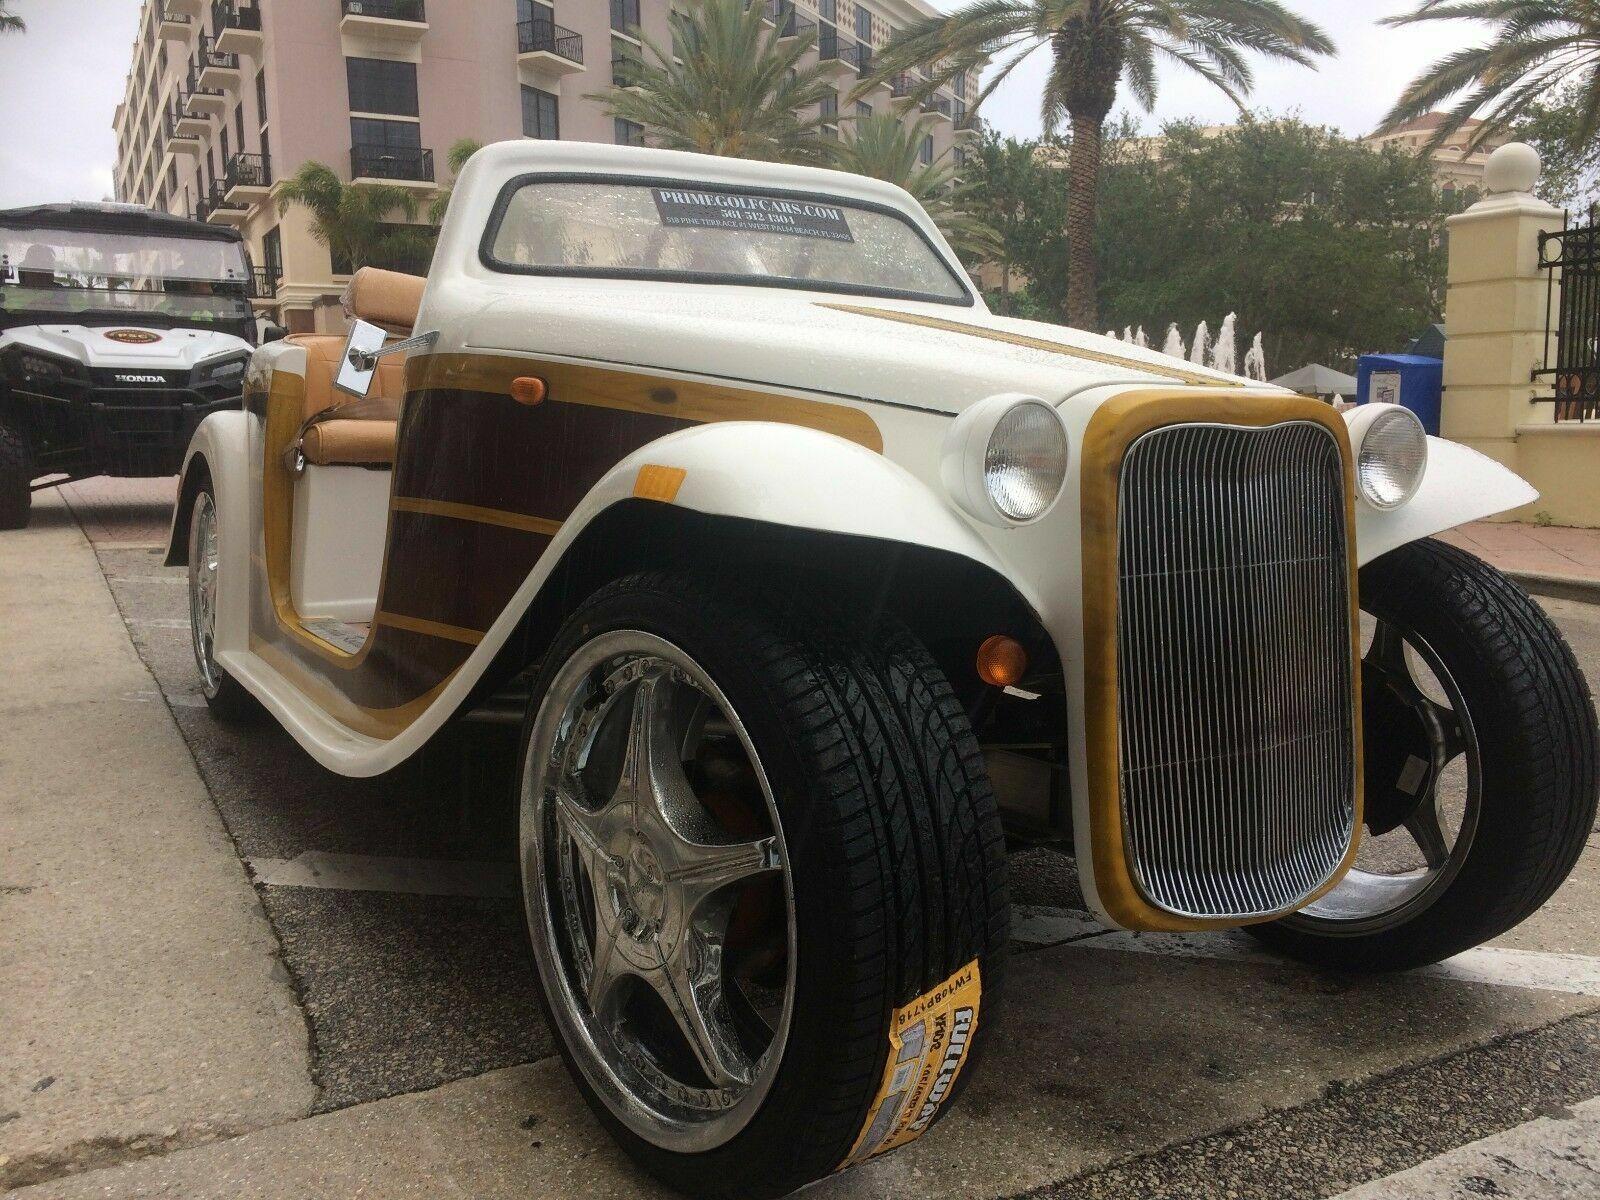 2016 acg california roadster Woody Golf Cart Street Legal Lsv 4 passenger seat